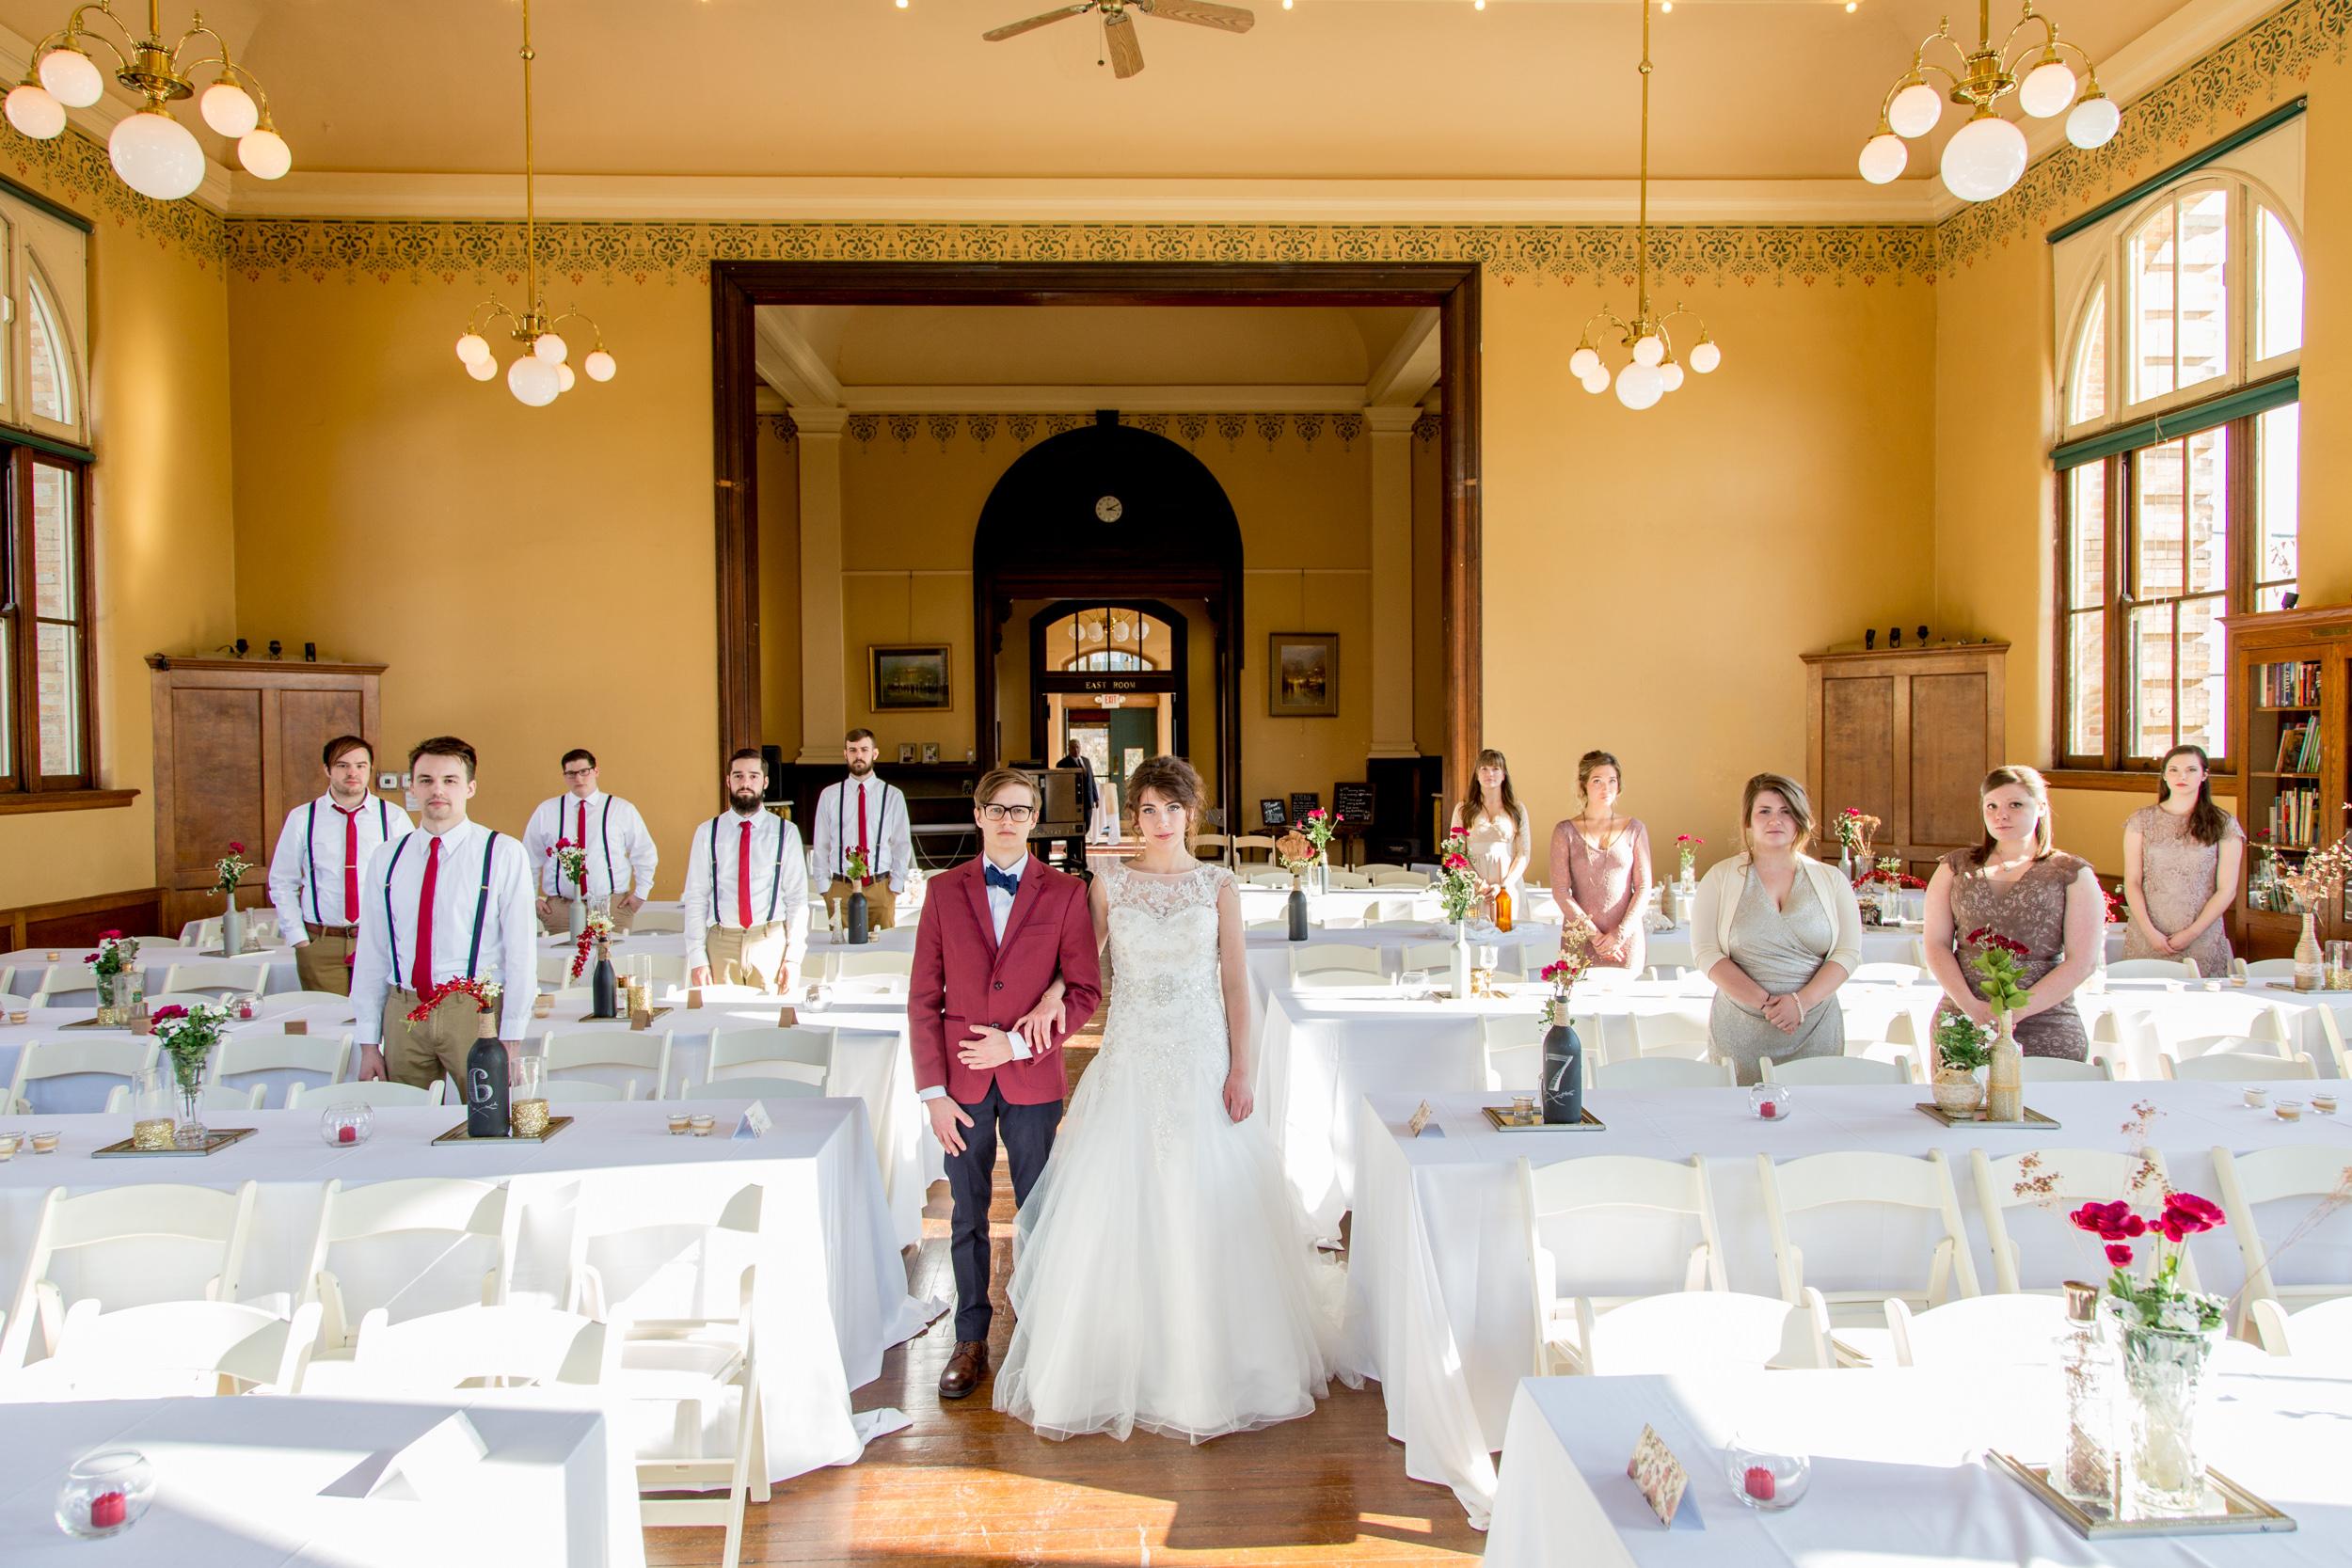 TheSmythCollective-Best-Cincinnati-Wedding-Photographer-029.jpg